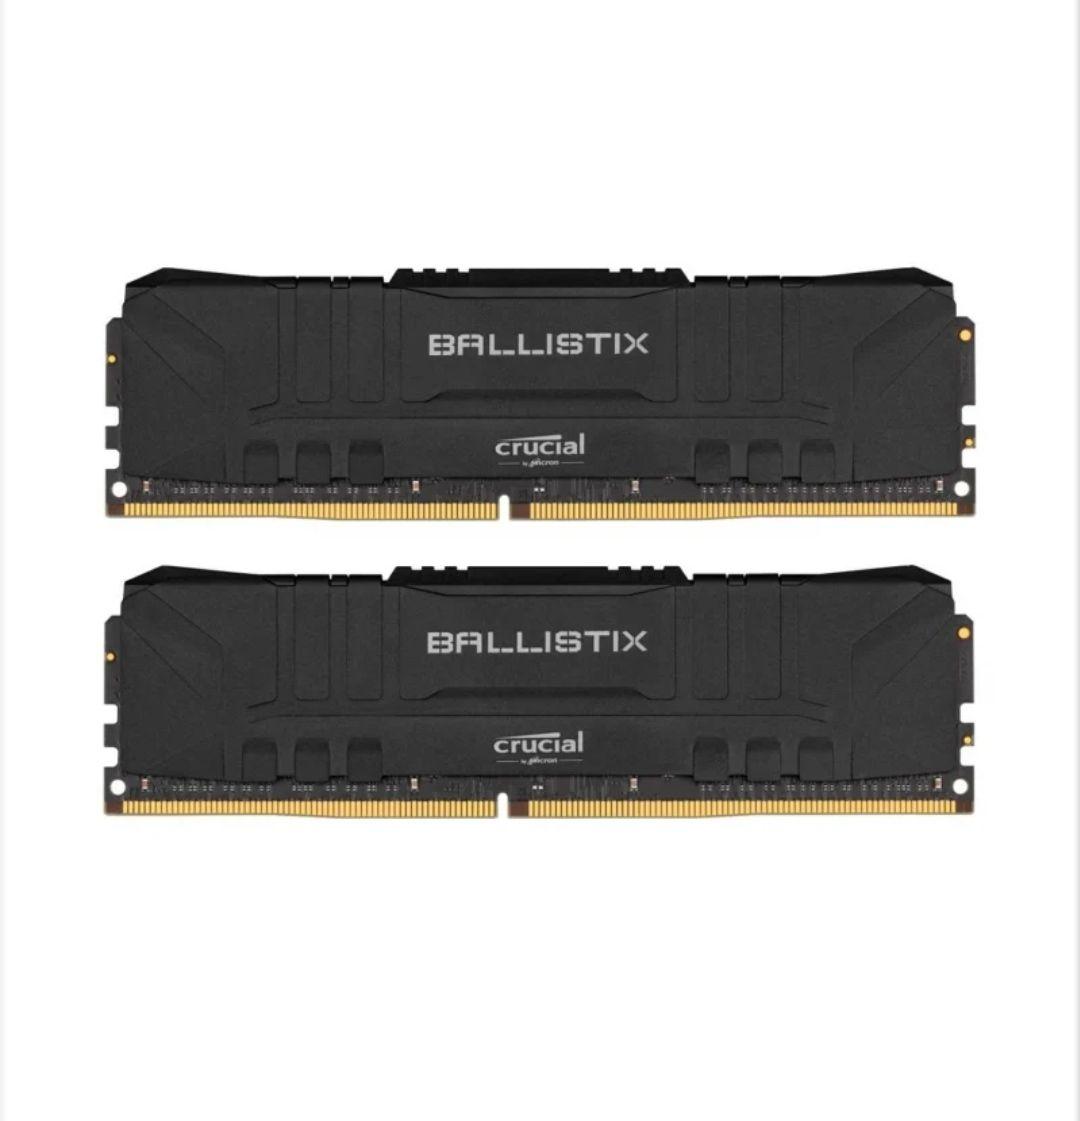 Pamięć RAM Crucial 16GB (2x8GB) 3200MHz CL16 Ballistix Black